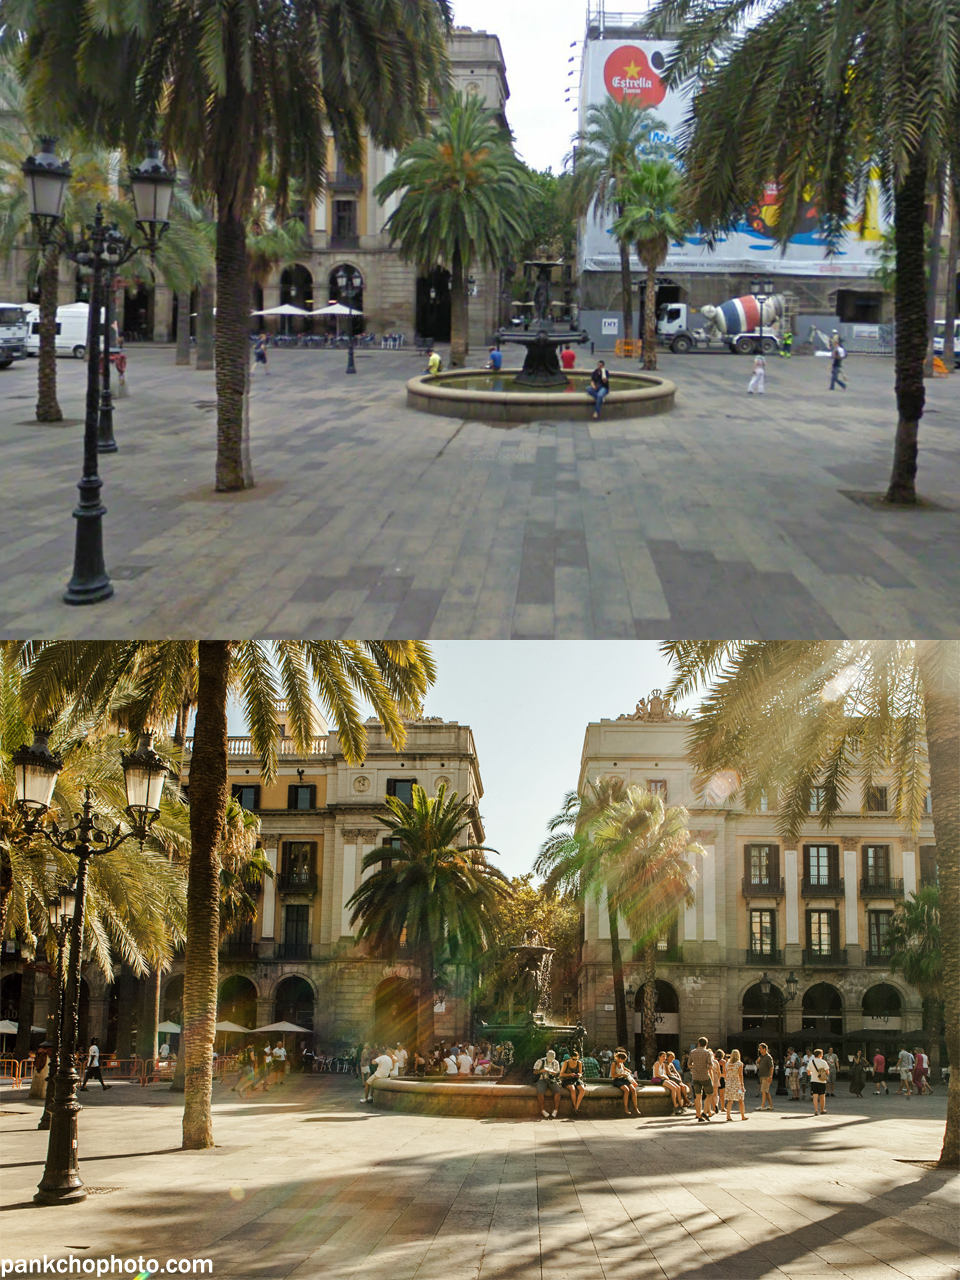 Up: Plaça Reial by Google Maps Street View - Barcelona, July 2009 Down: Plaça Reial by me - Barcelona, August 2013